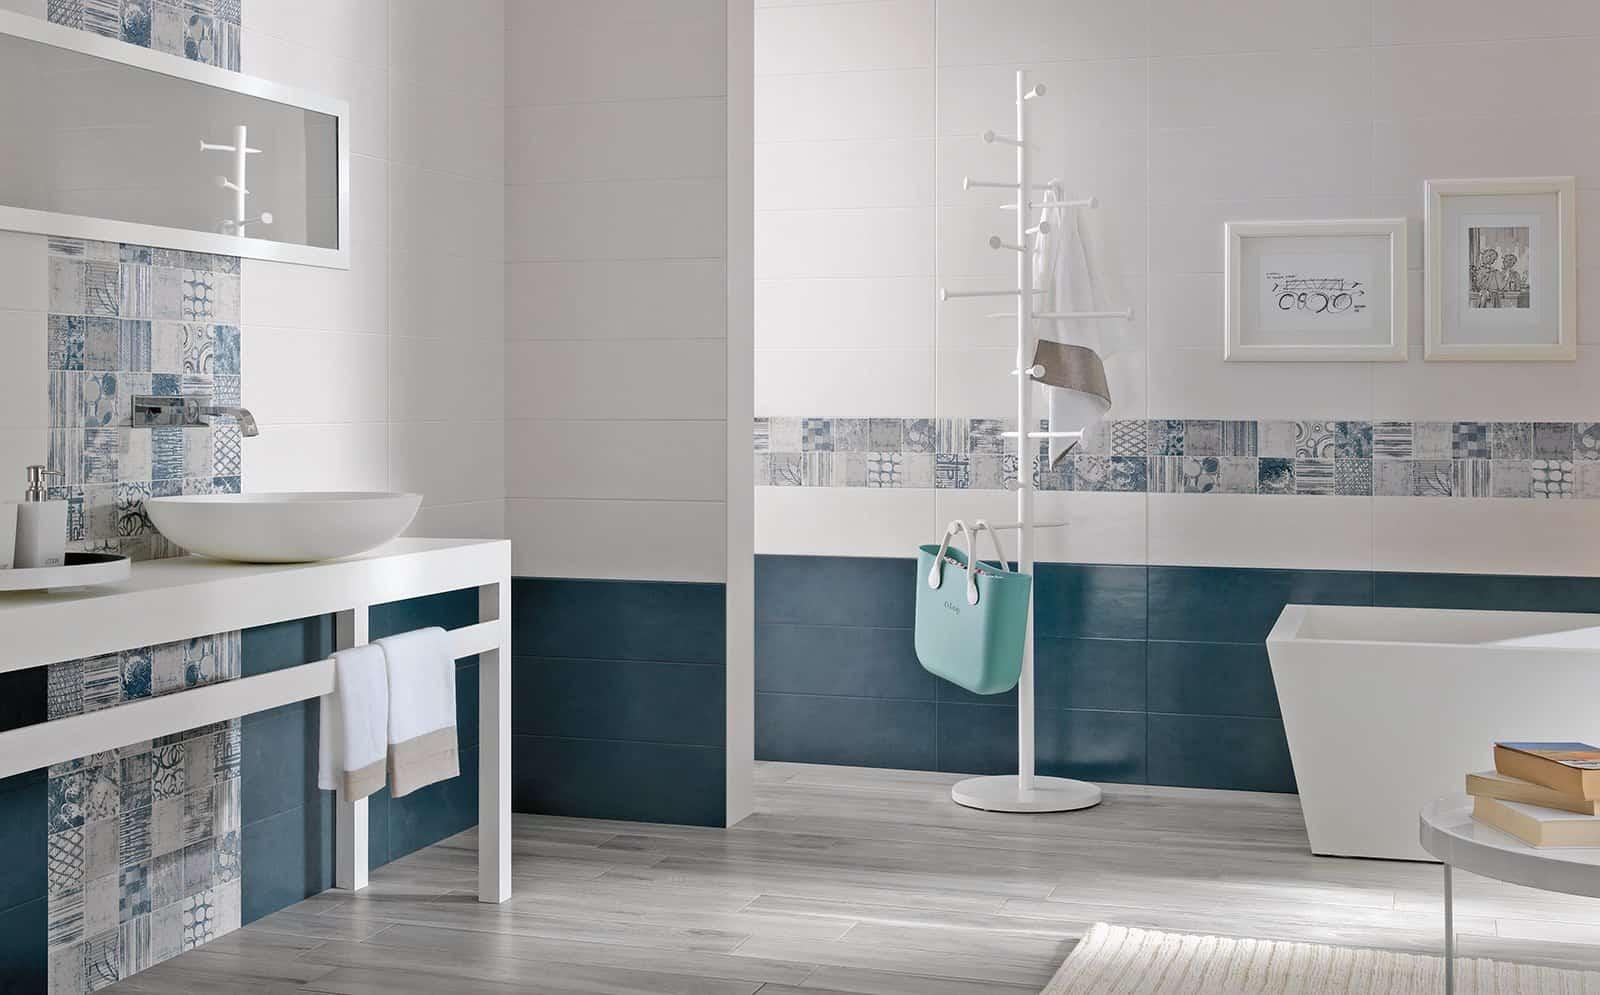 Serie soul pavimenti e rivestimenti musis - Pavimento e rivestimento bagno uguale ...